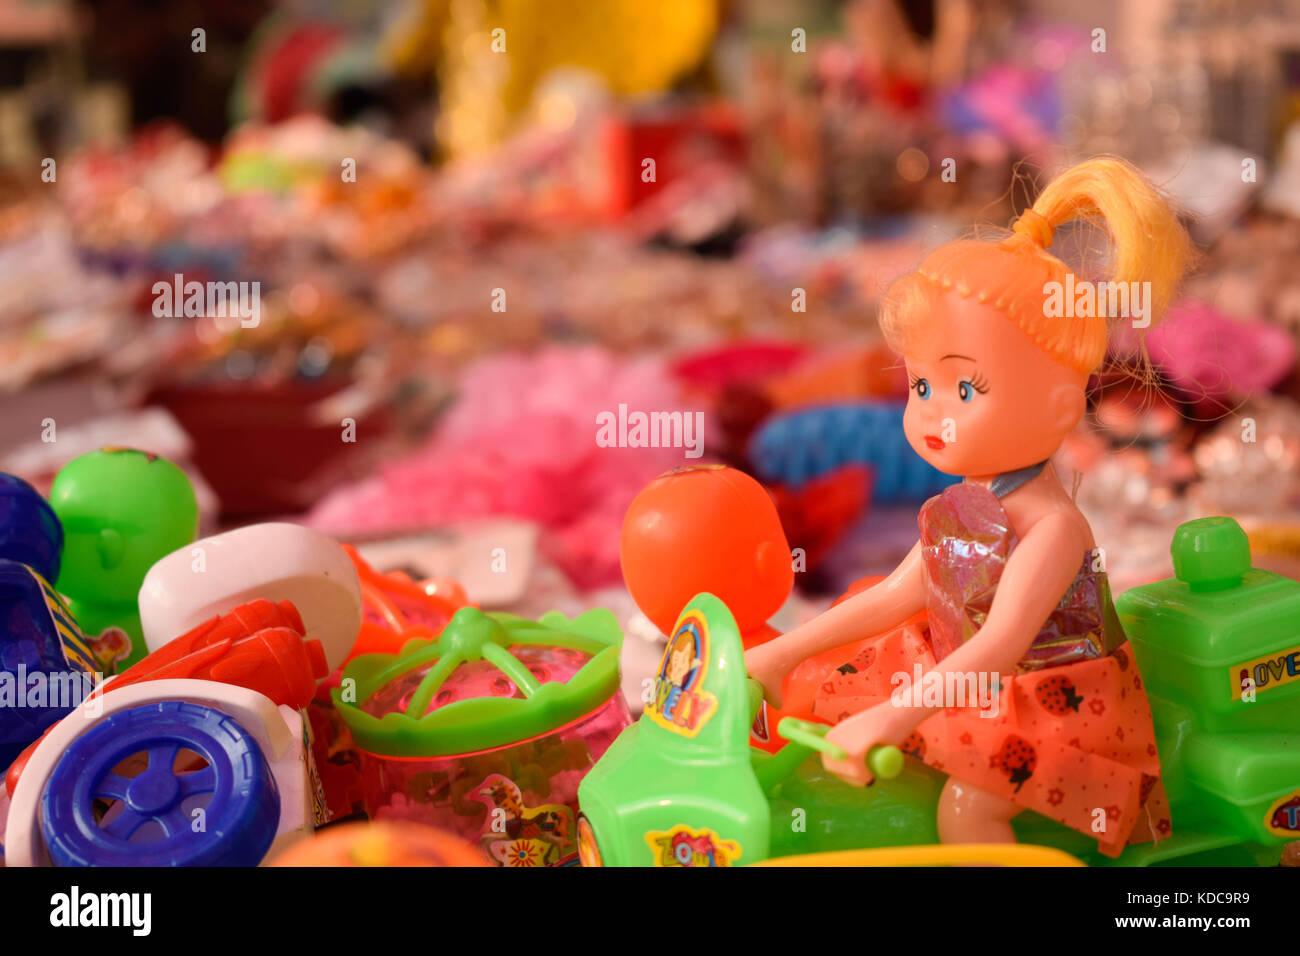 Beautiful handmade showpieces in a roadside souvenir shop in Dhaka - Stock Image